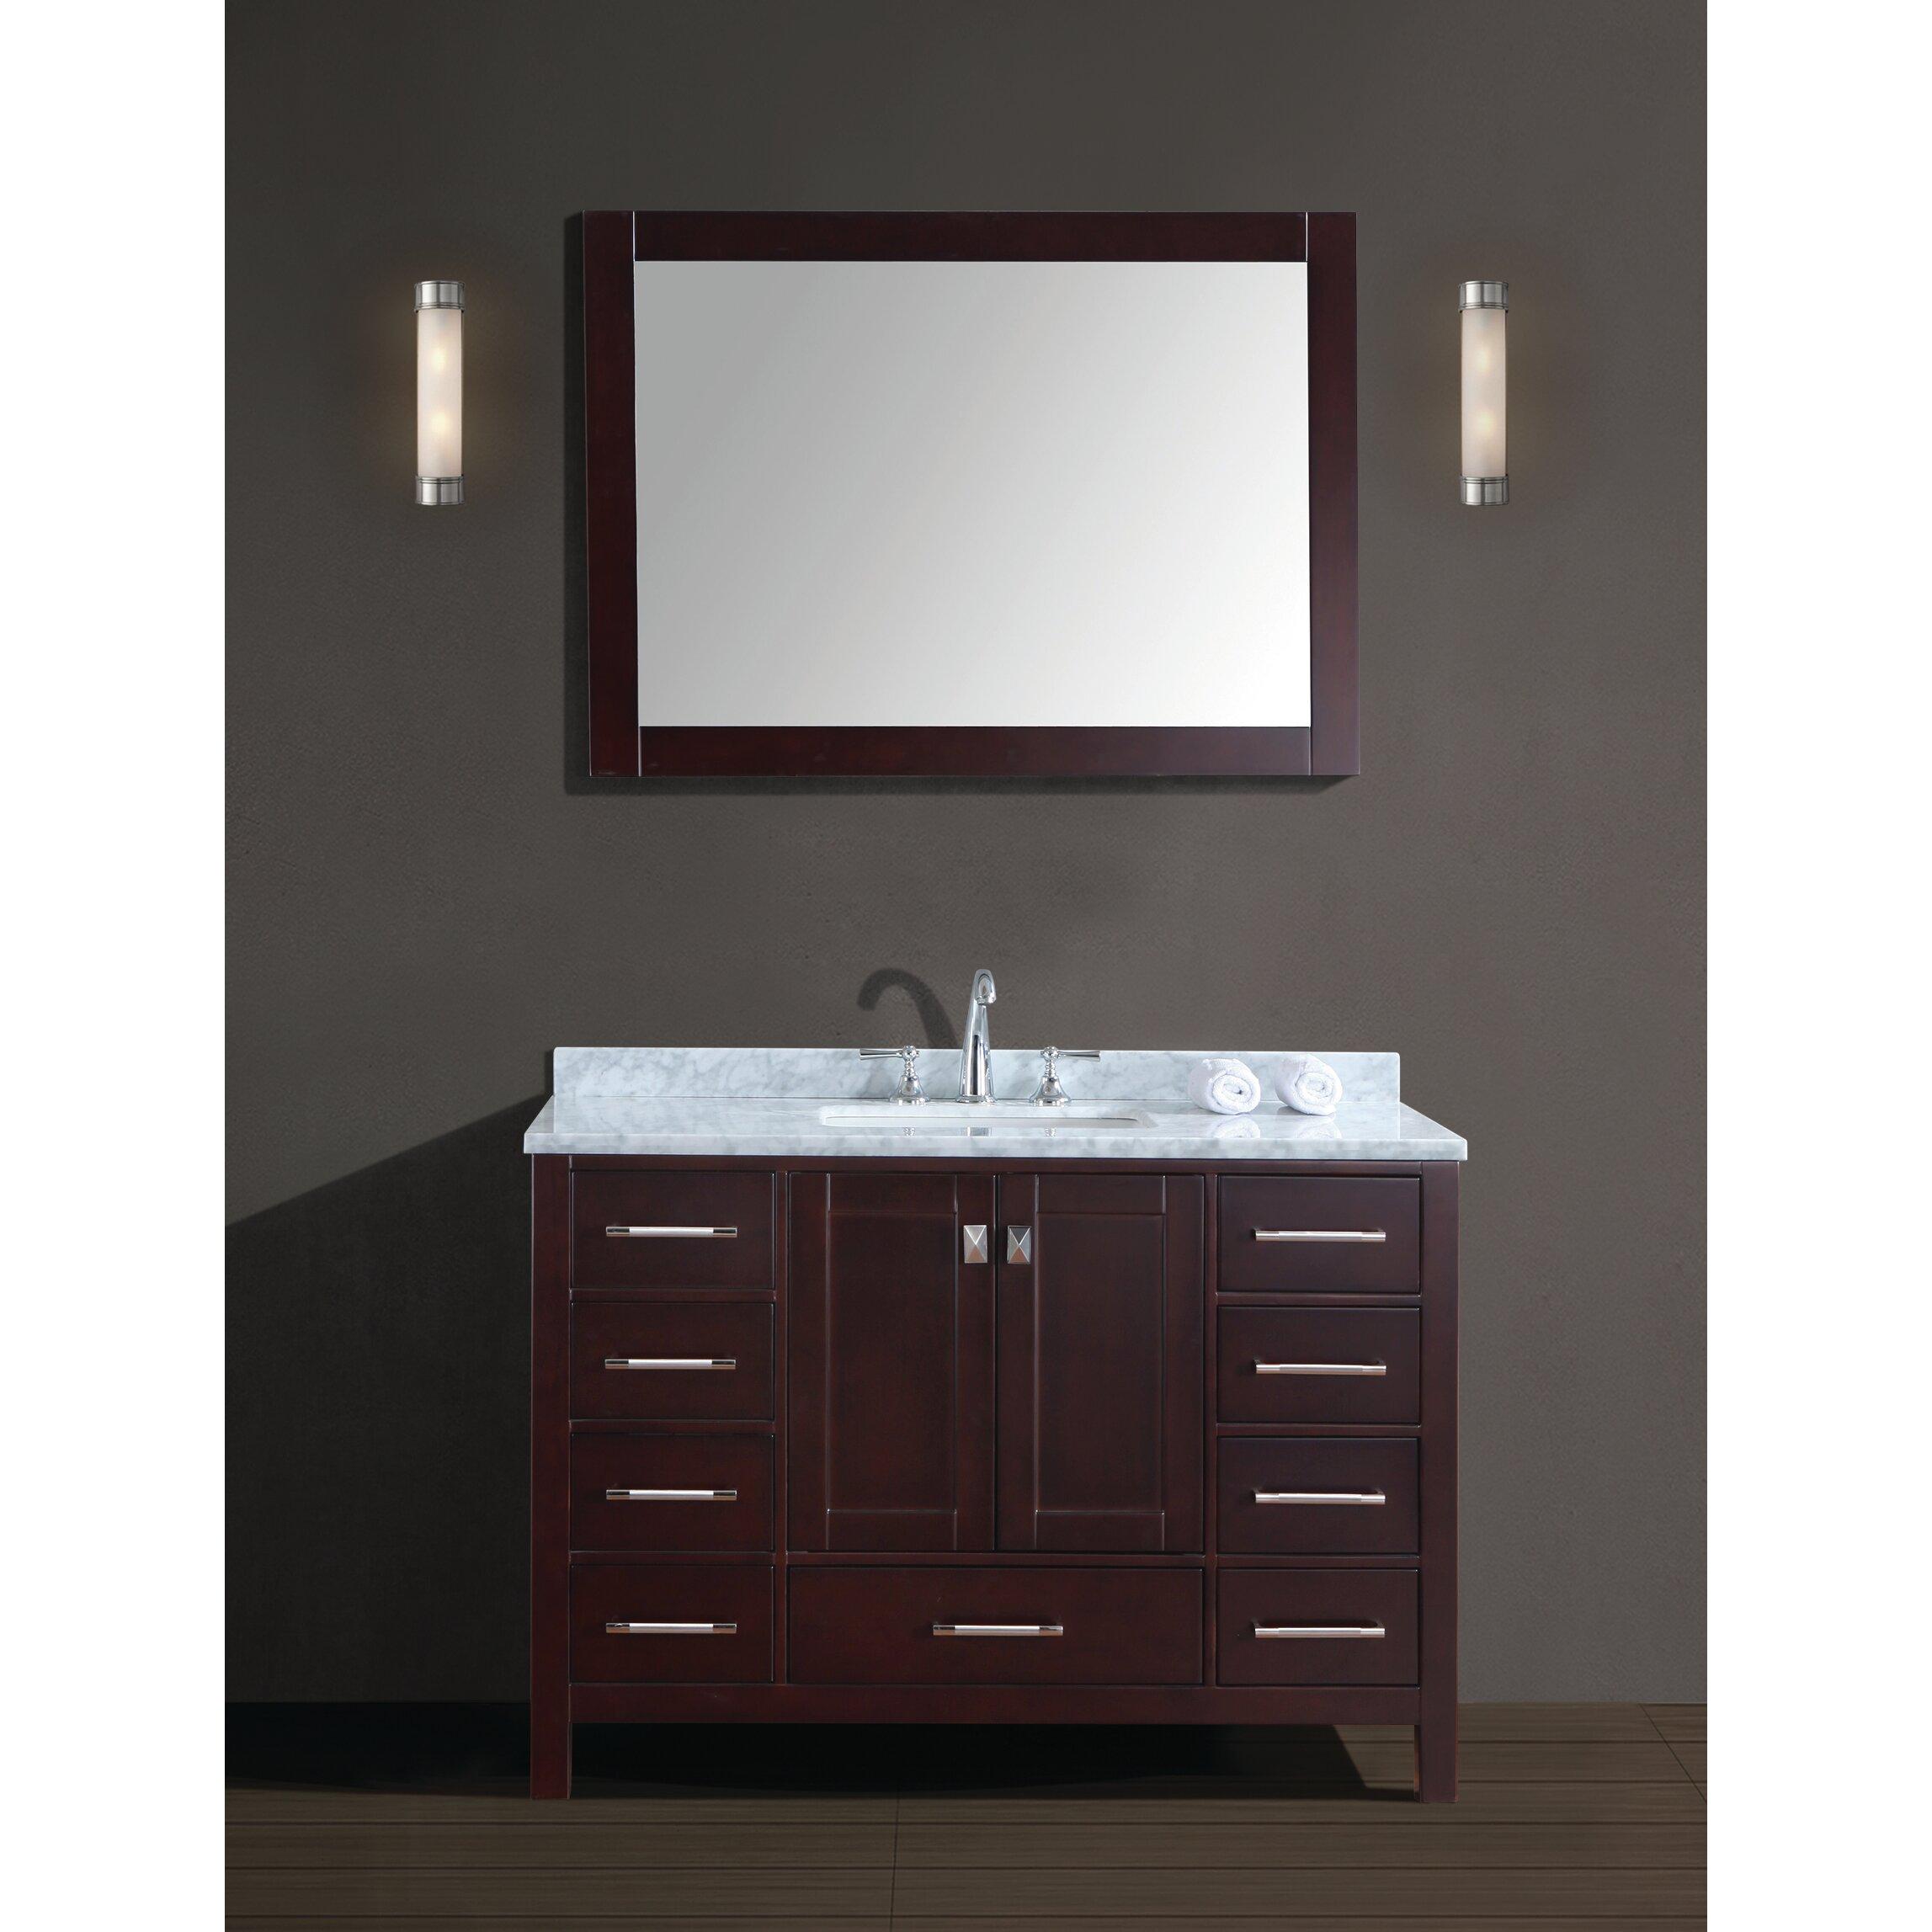 Ari kitchen bath bella sp 48 single bathroom vanity set for Bathroom mirror set